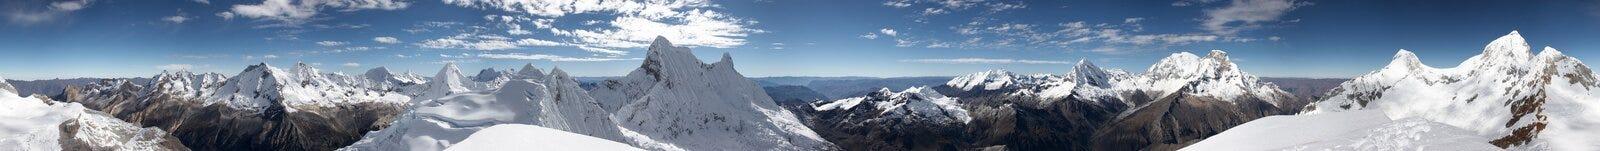 Gipfelpanorama stockbilder